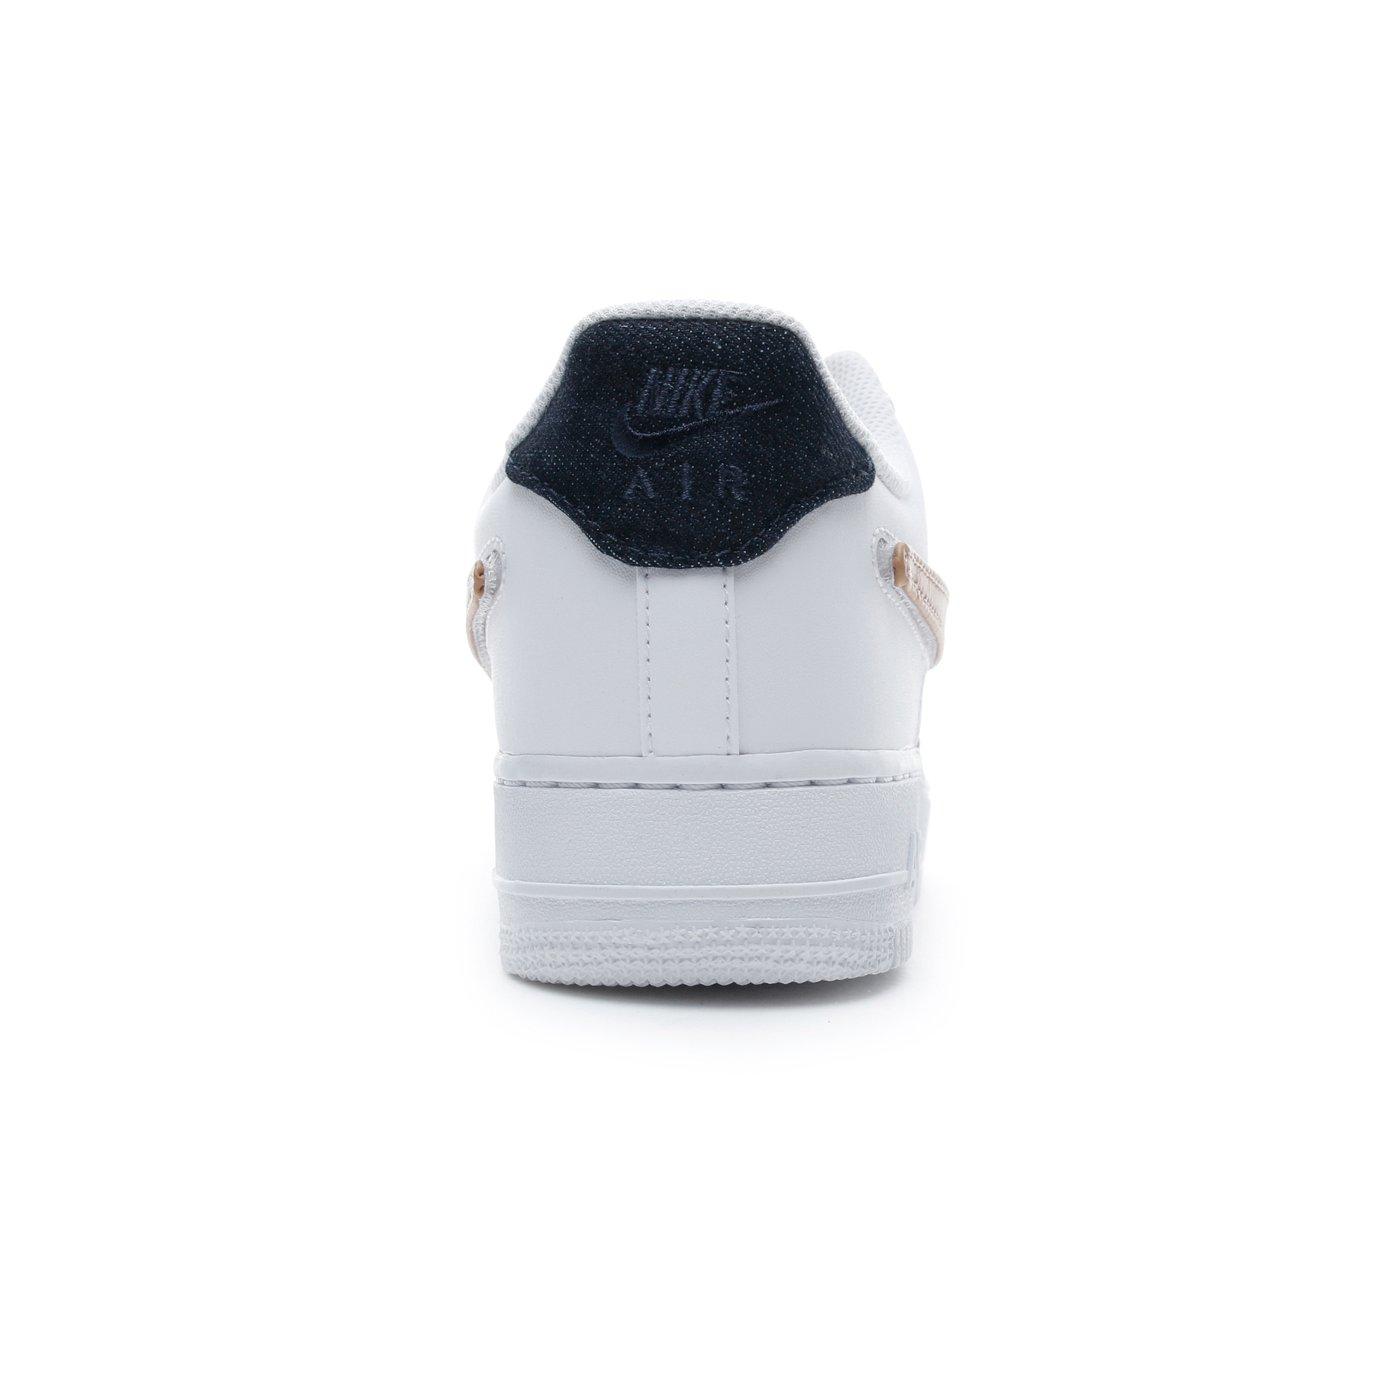 Nike Air Force 1 '07 Lv8 3 Beyaz Erkek Spor Ayakkabi